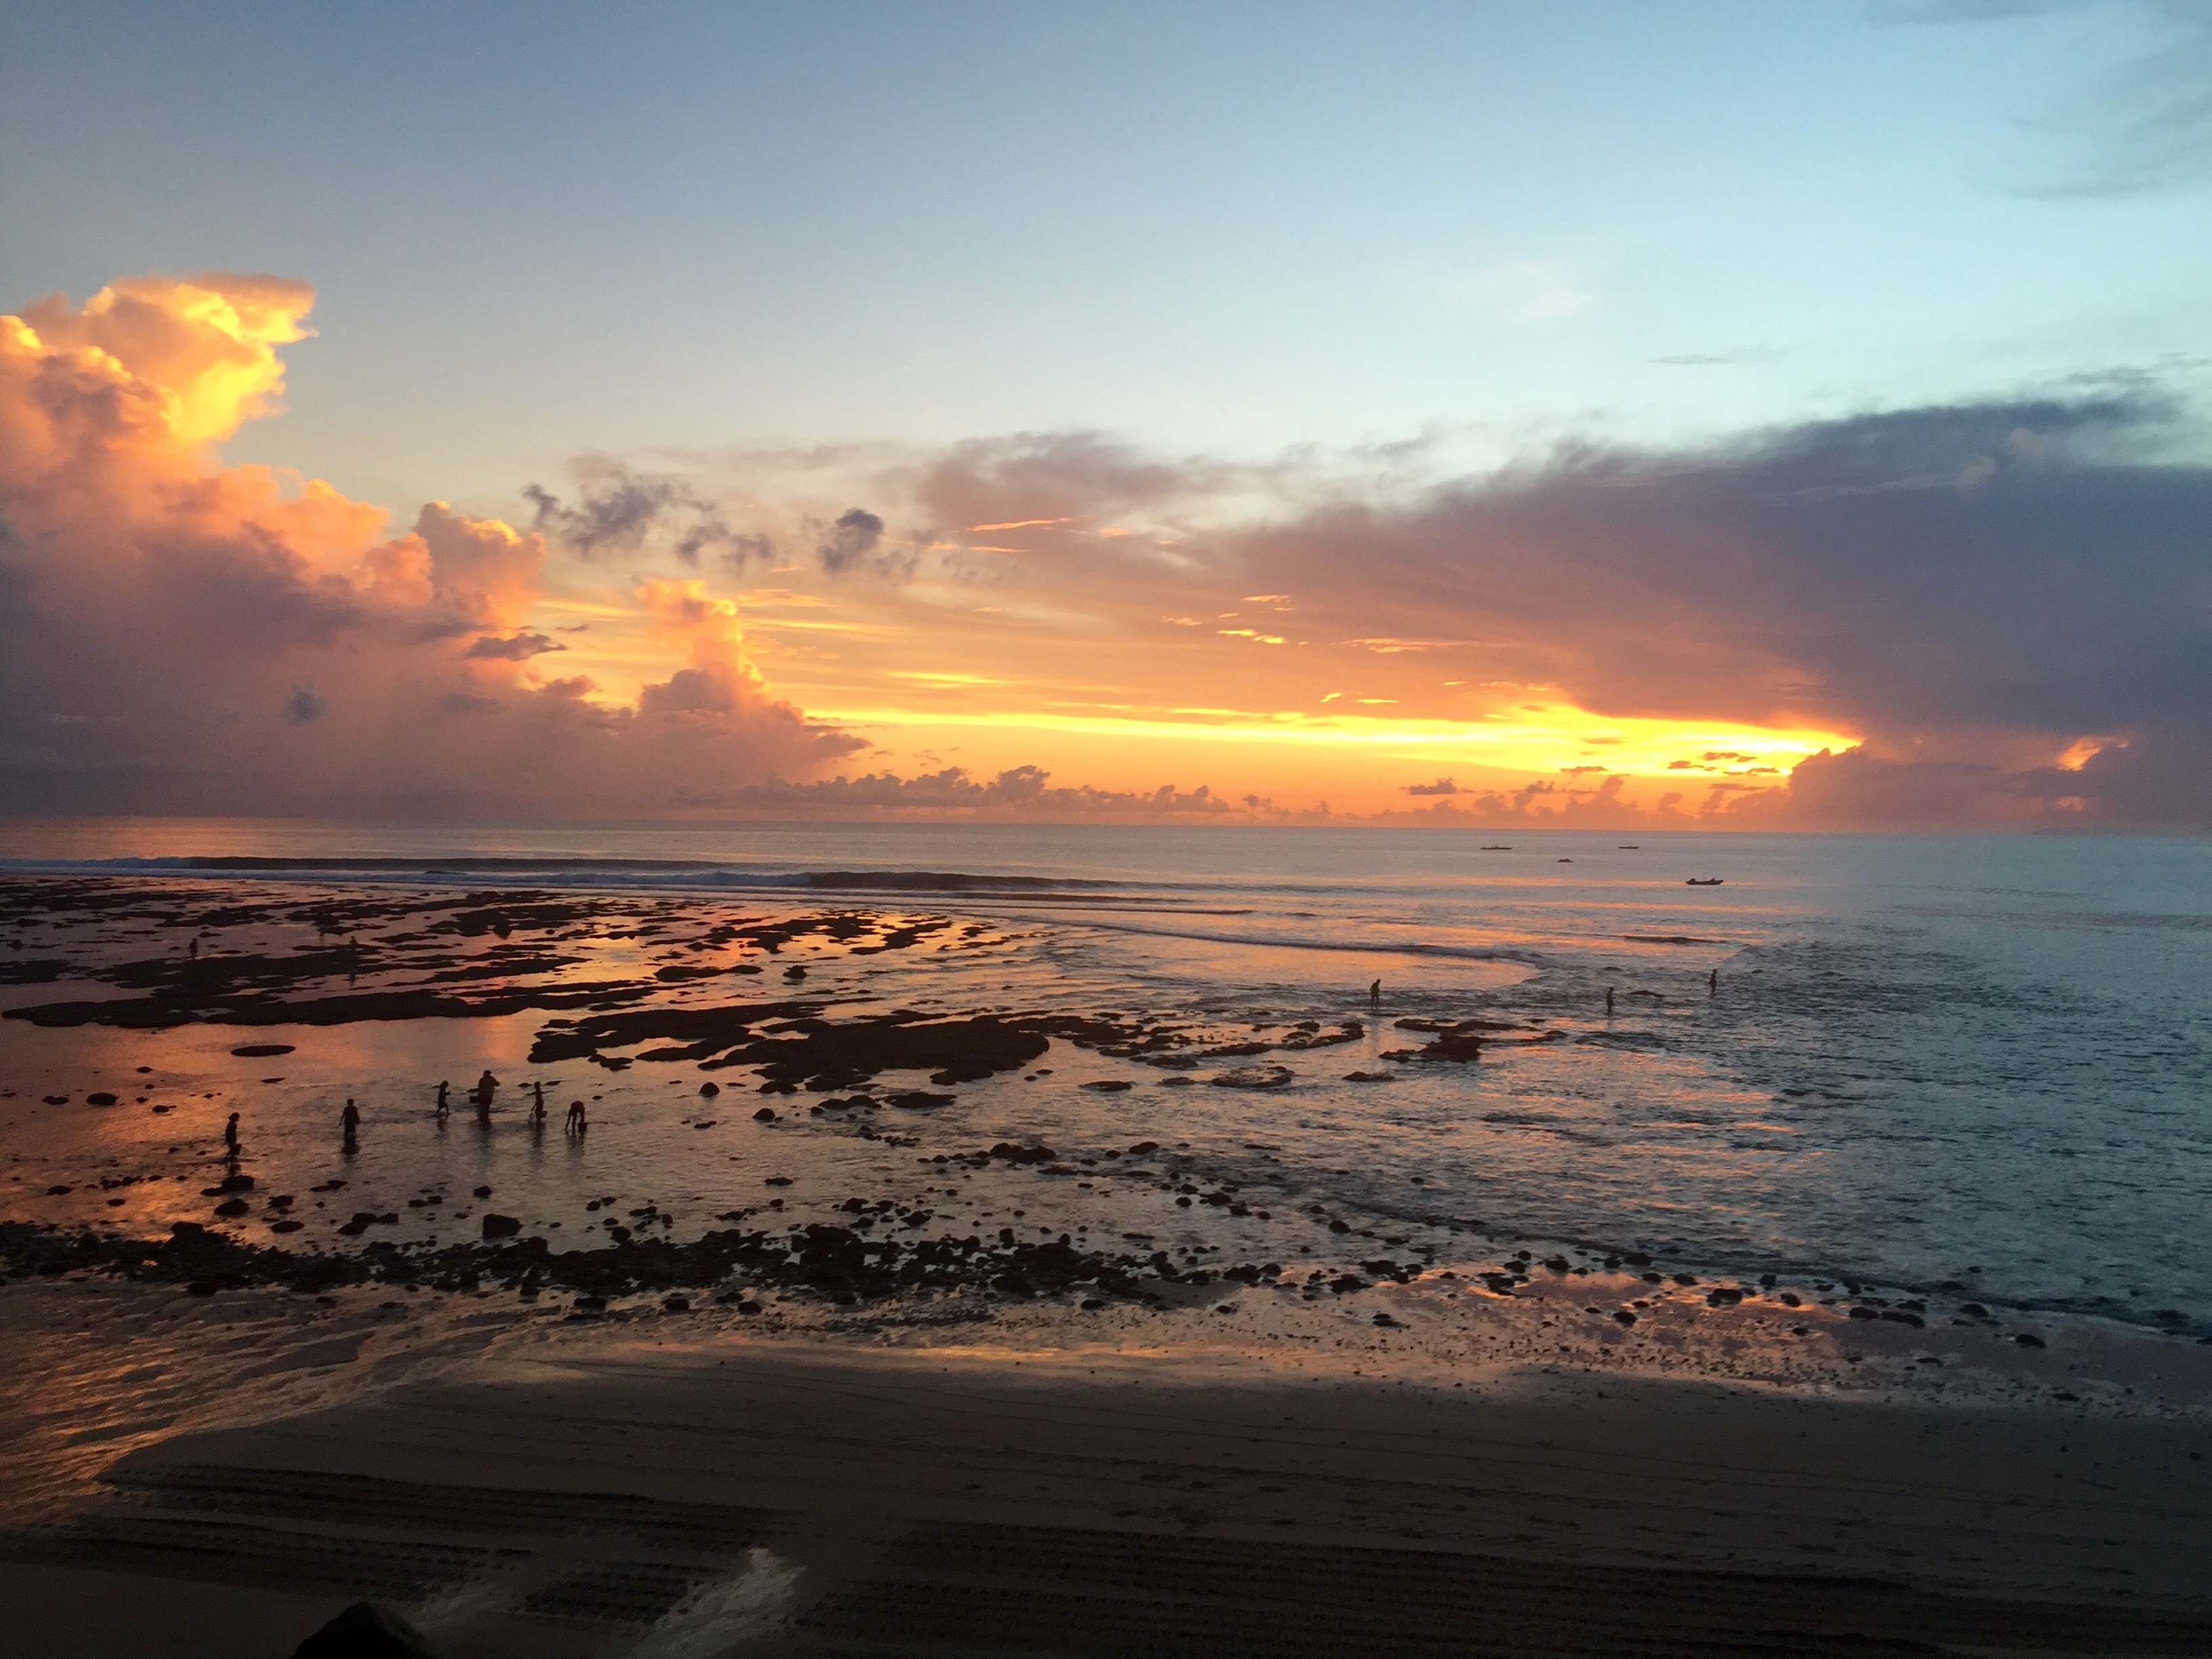 Sumba sunset at Nihiwatu